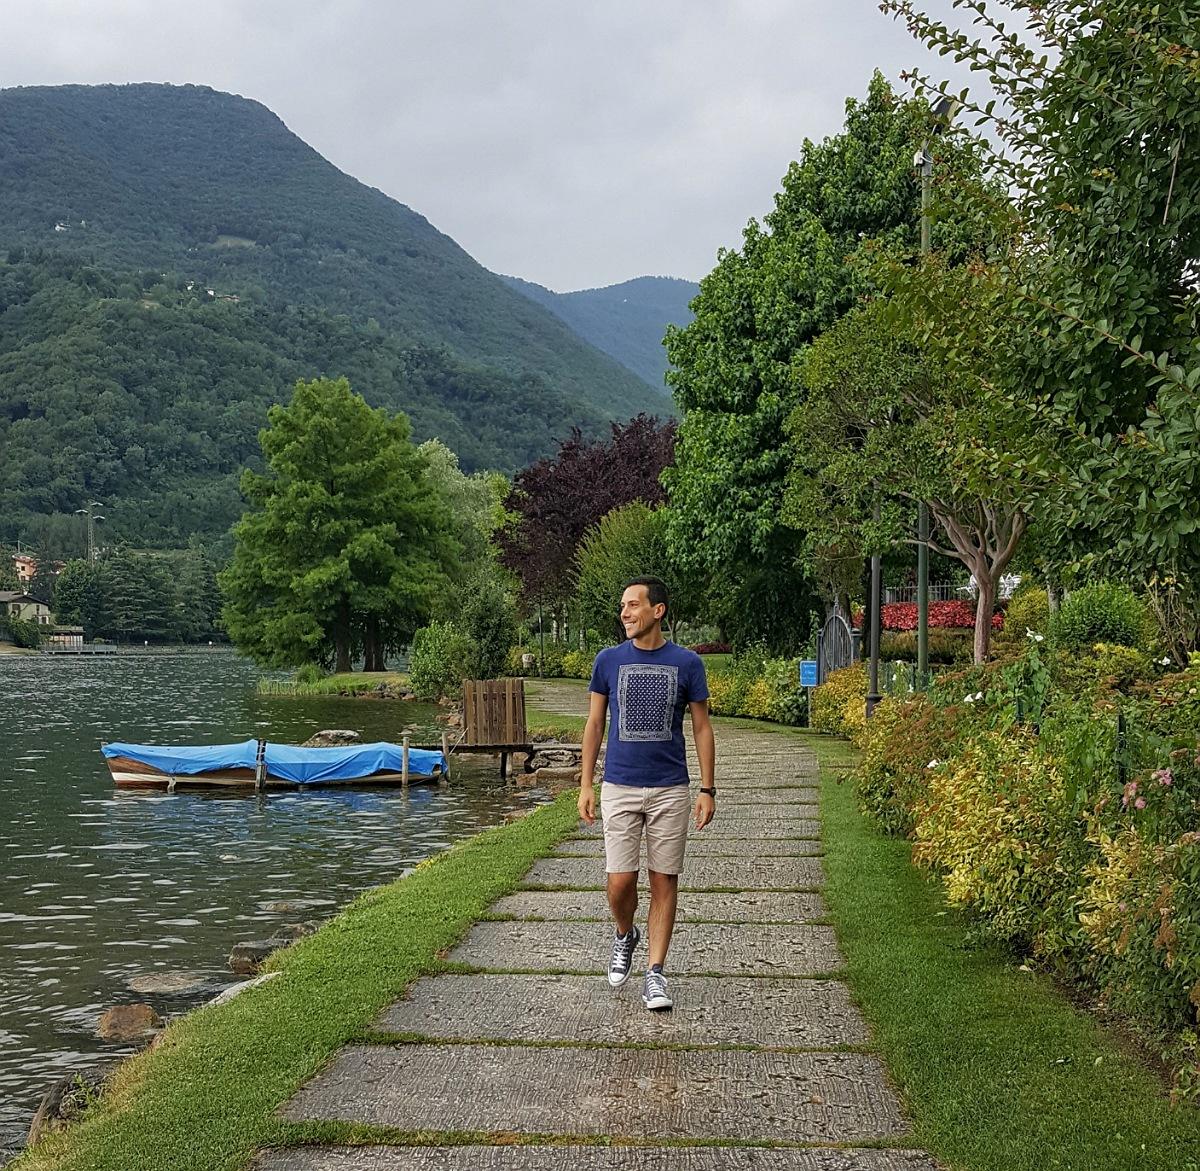 gita bergamo PASSEGGIATA aria aperta lago di endine passeggiata